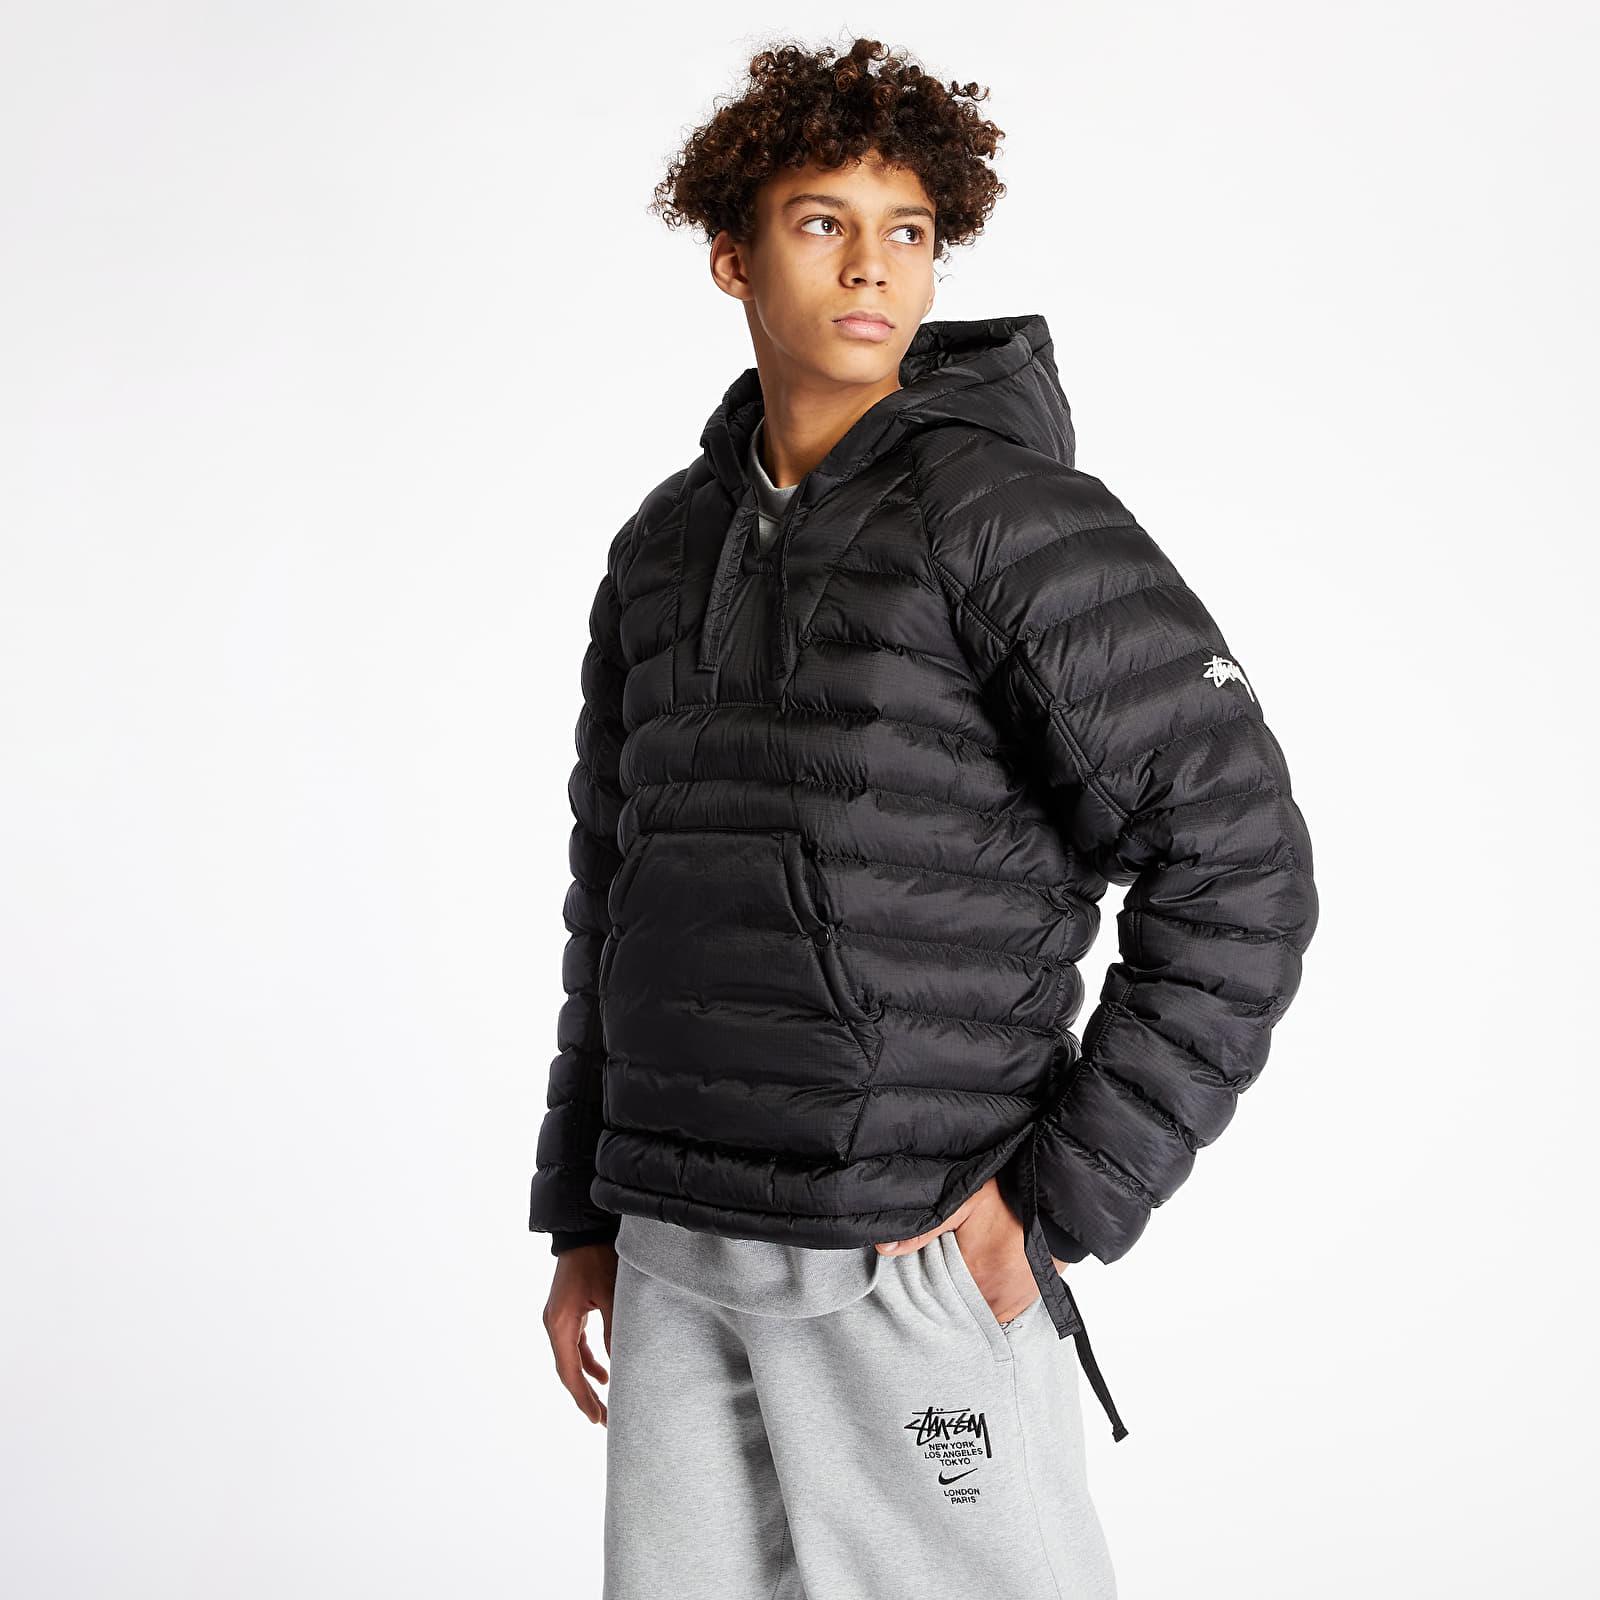 Bundy Nike x Stüssy NRG Puffer Jacket Black